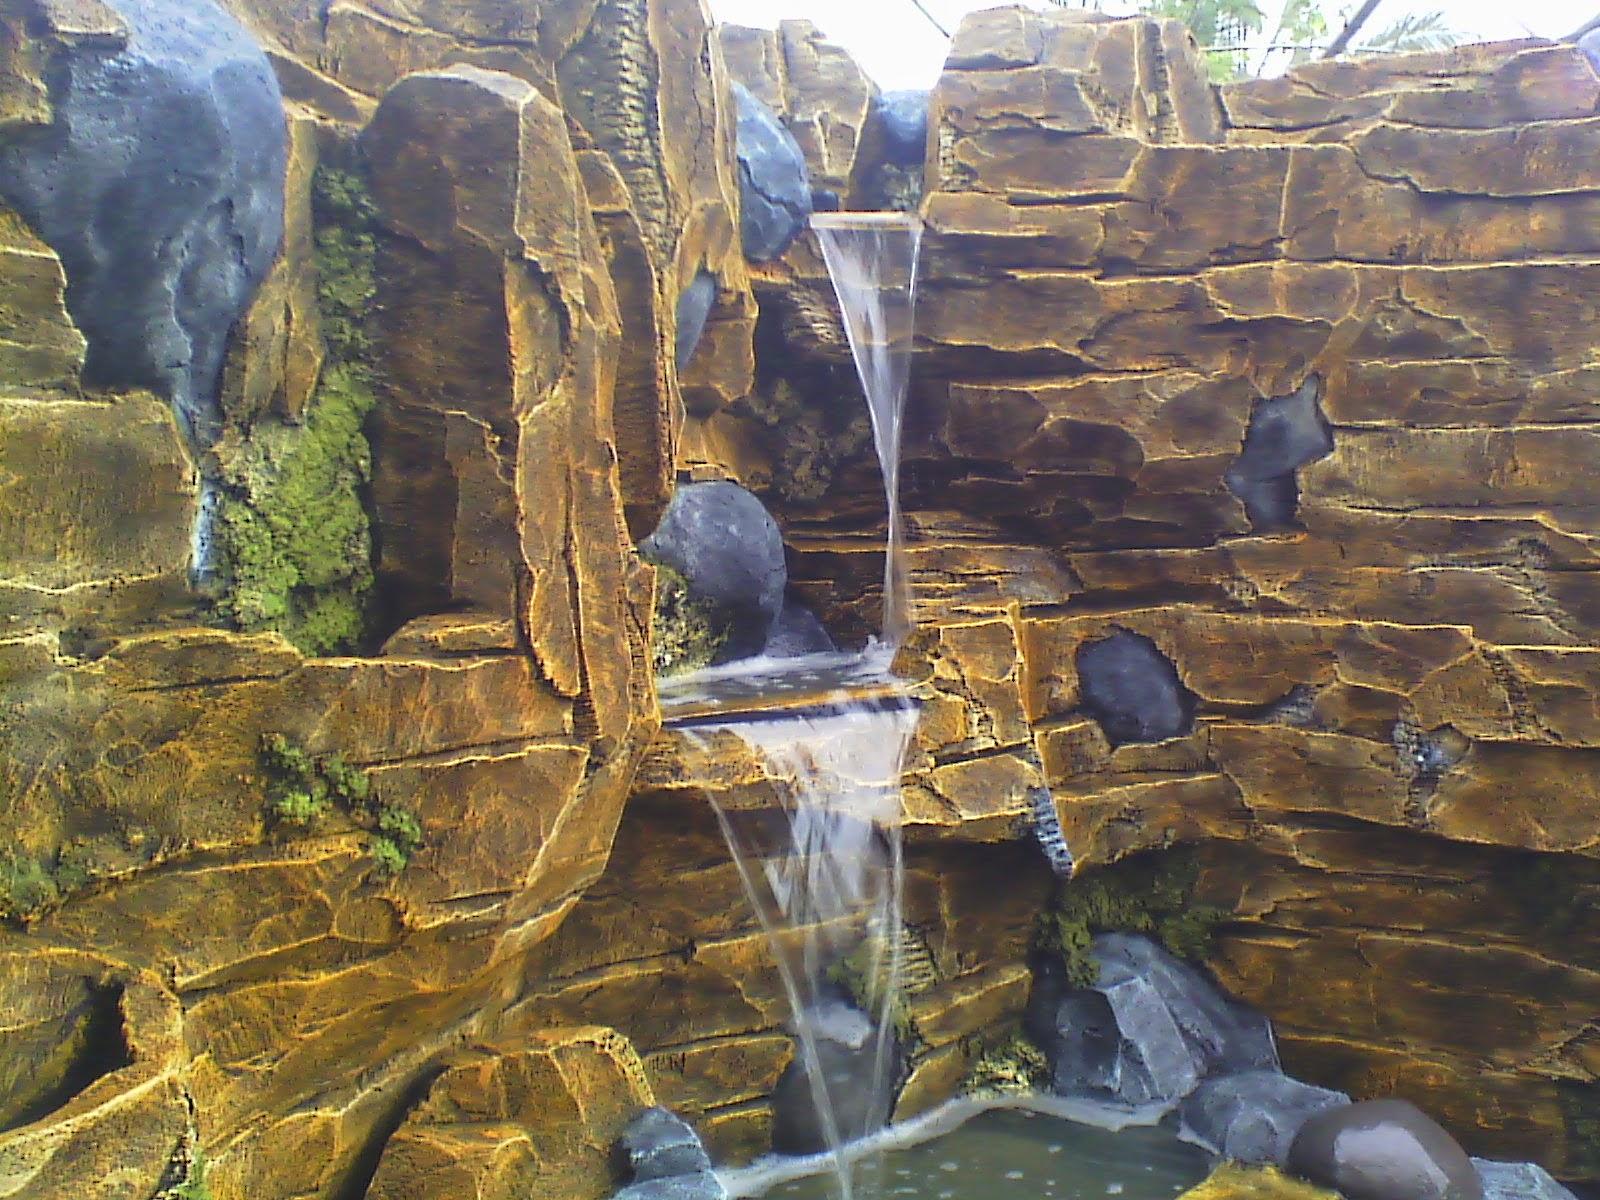 http://tukangtamanqu.blogspot.com/2014/11/jasa-pembuatan-taman-relief-cadas-dan.html